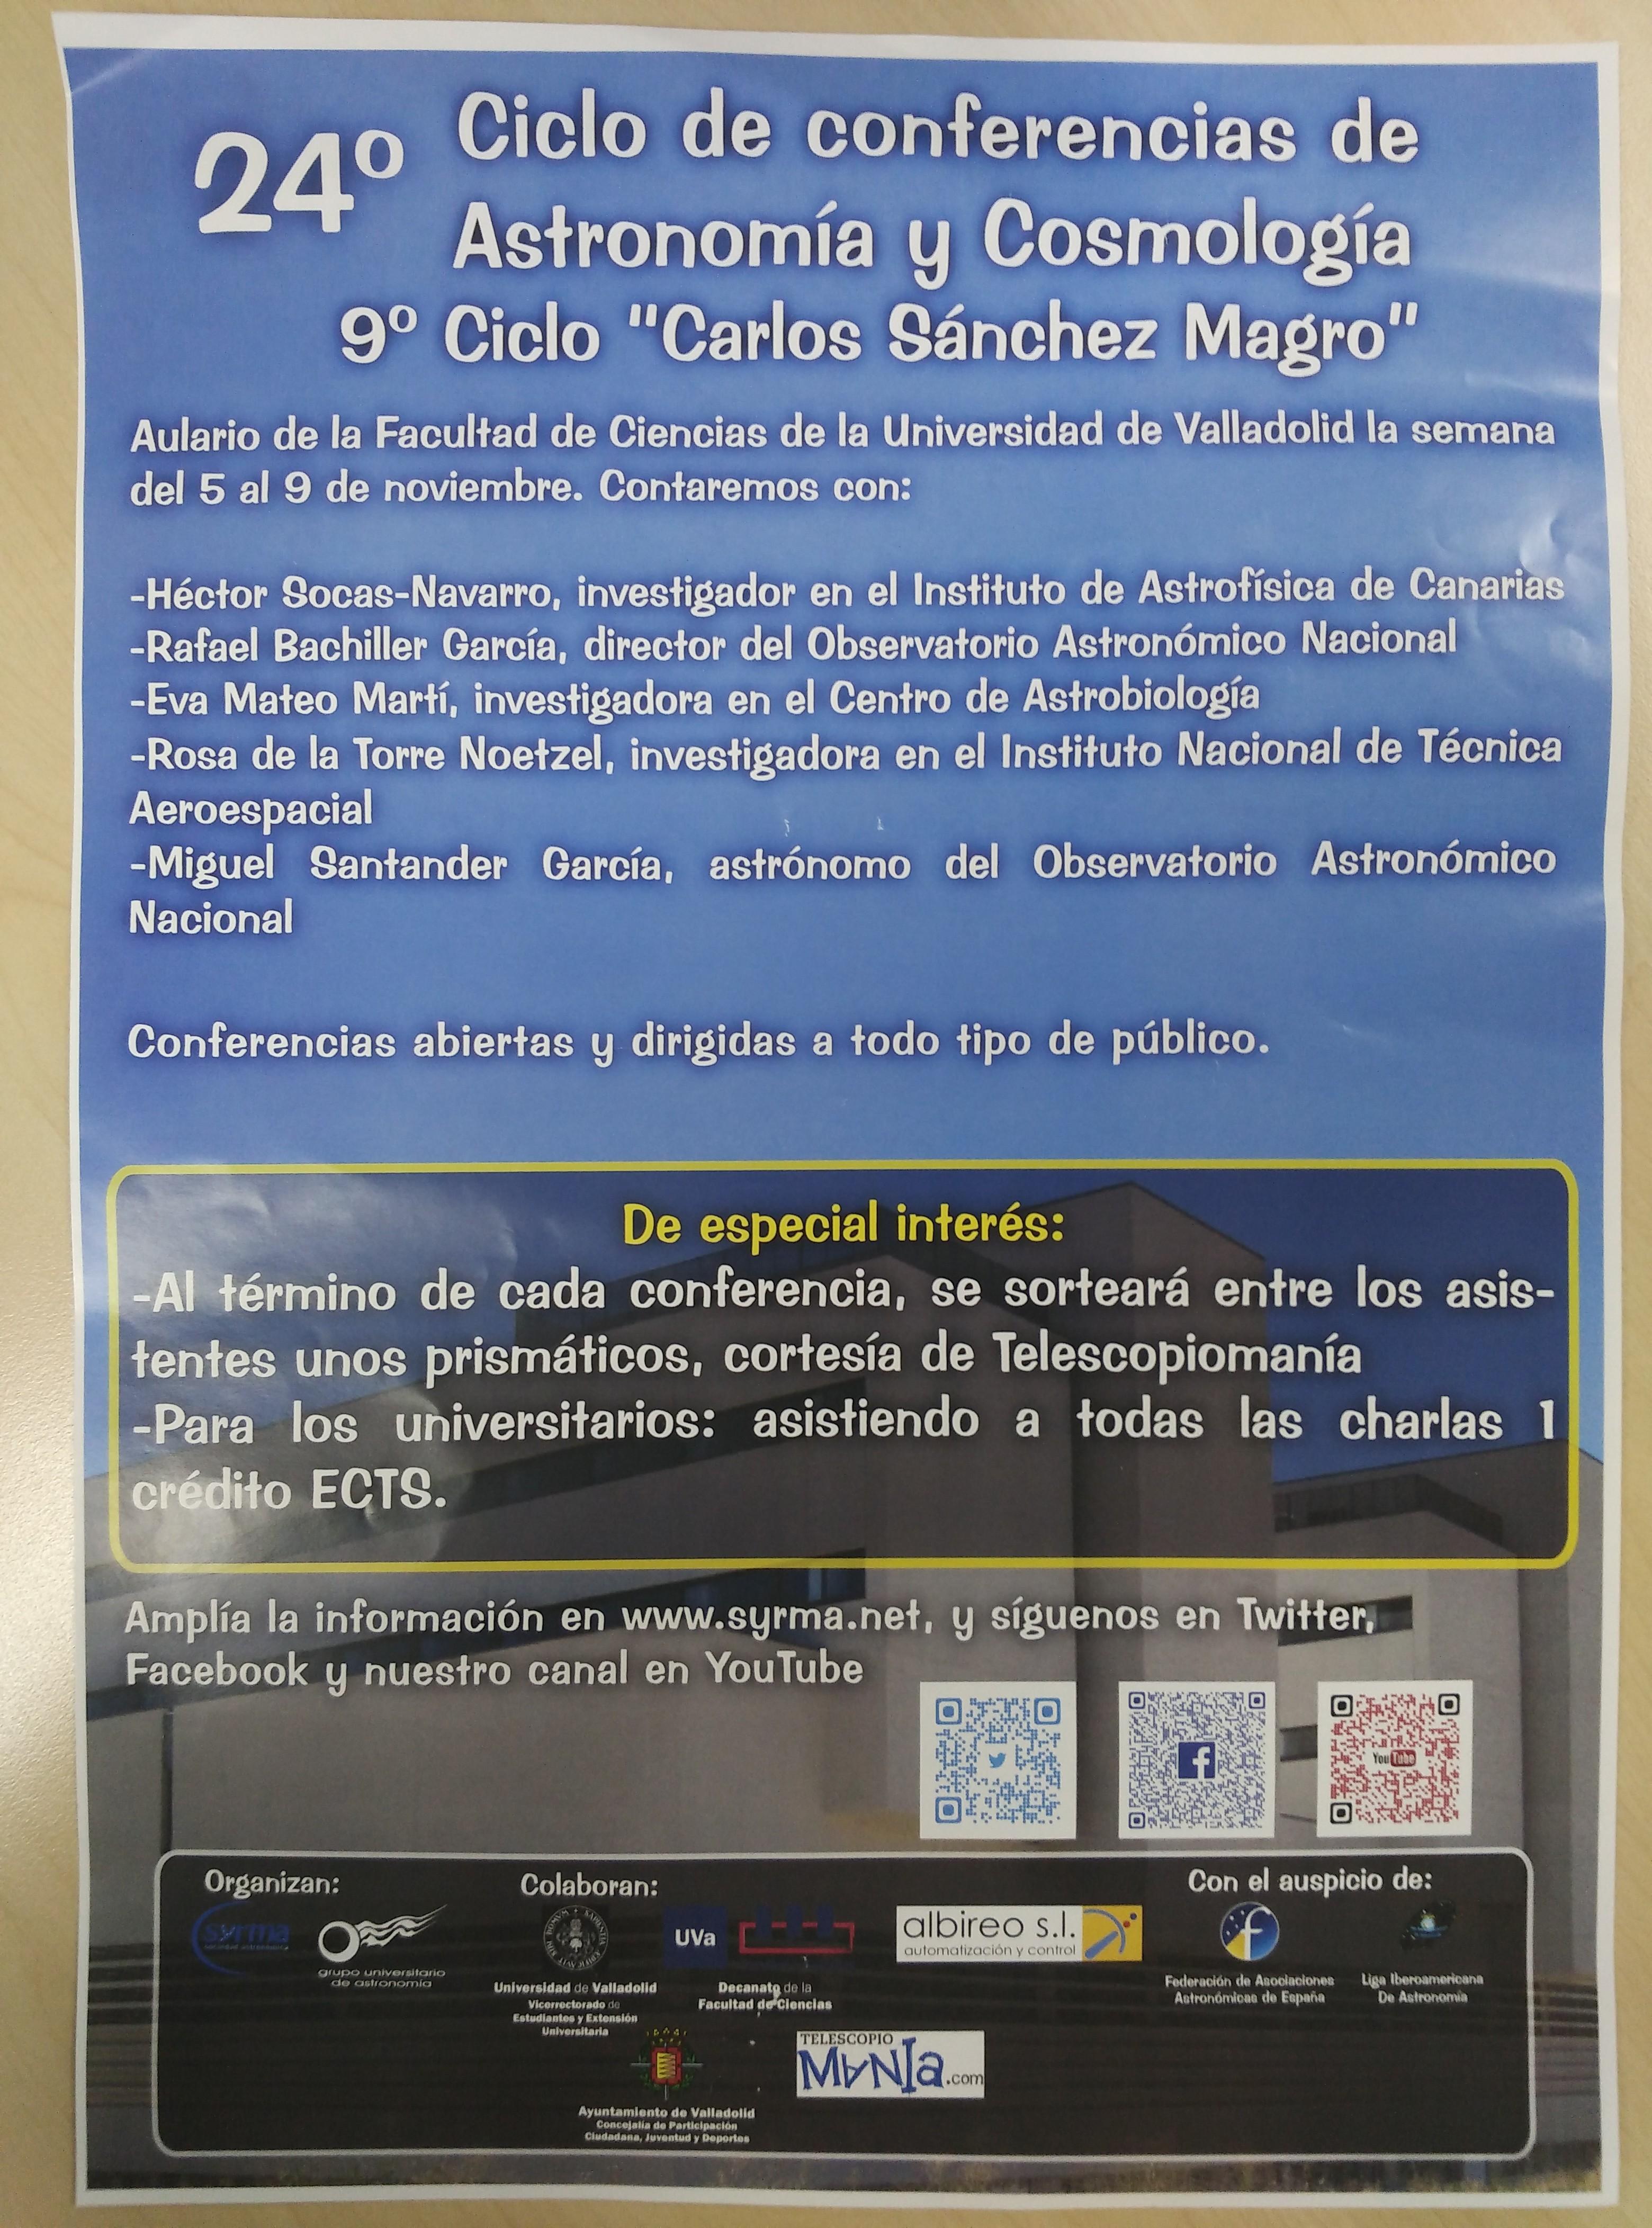 Calendario 2019 Por Semanas Mexico Más Arriba-a-fecha eventos Of Calendario 2019 Por Semanas Mexico Más Actual Peri³dico Abc 1 De Agosto De 2018 Pages 1 16 Text Version